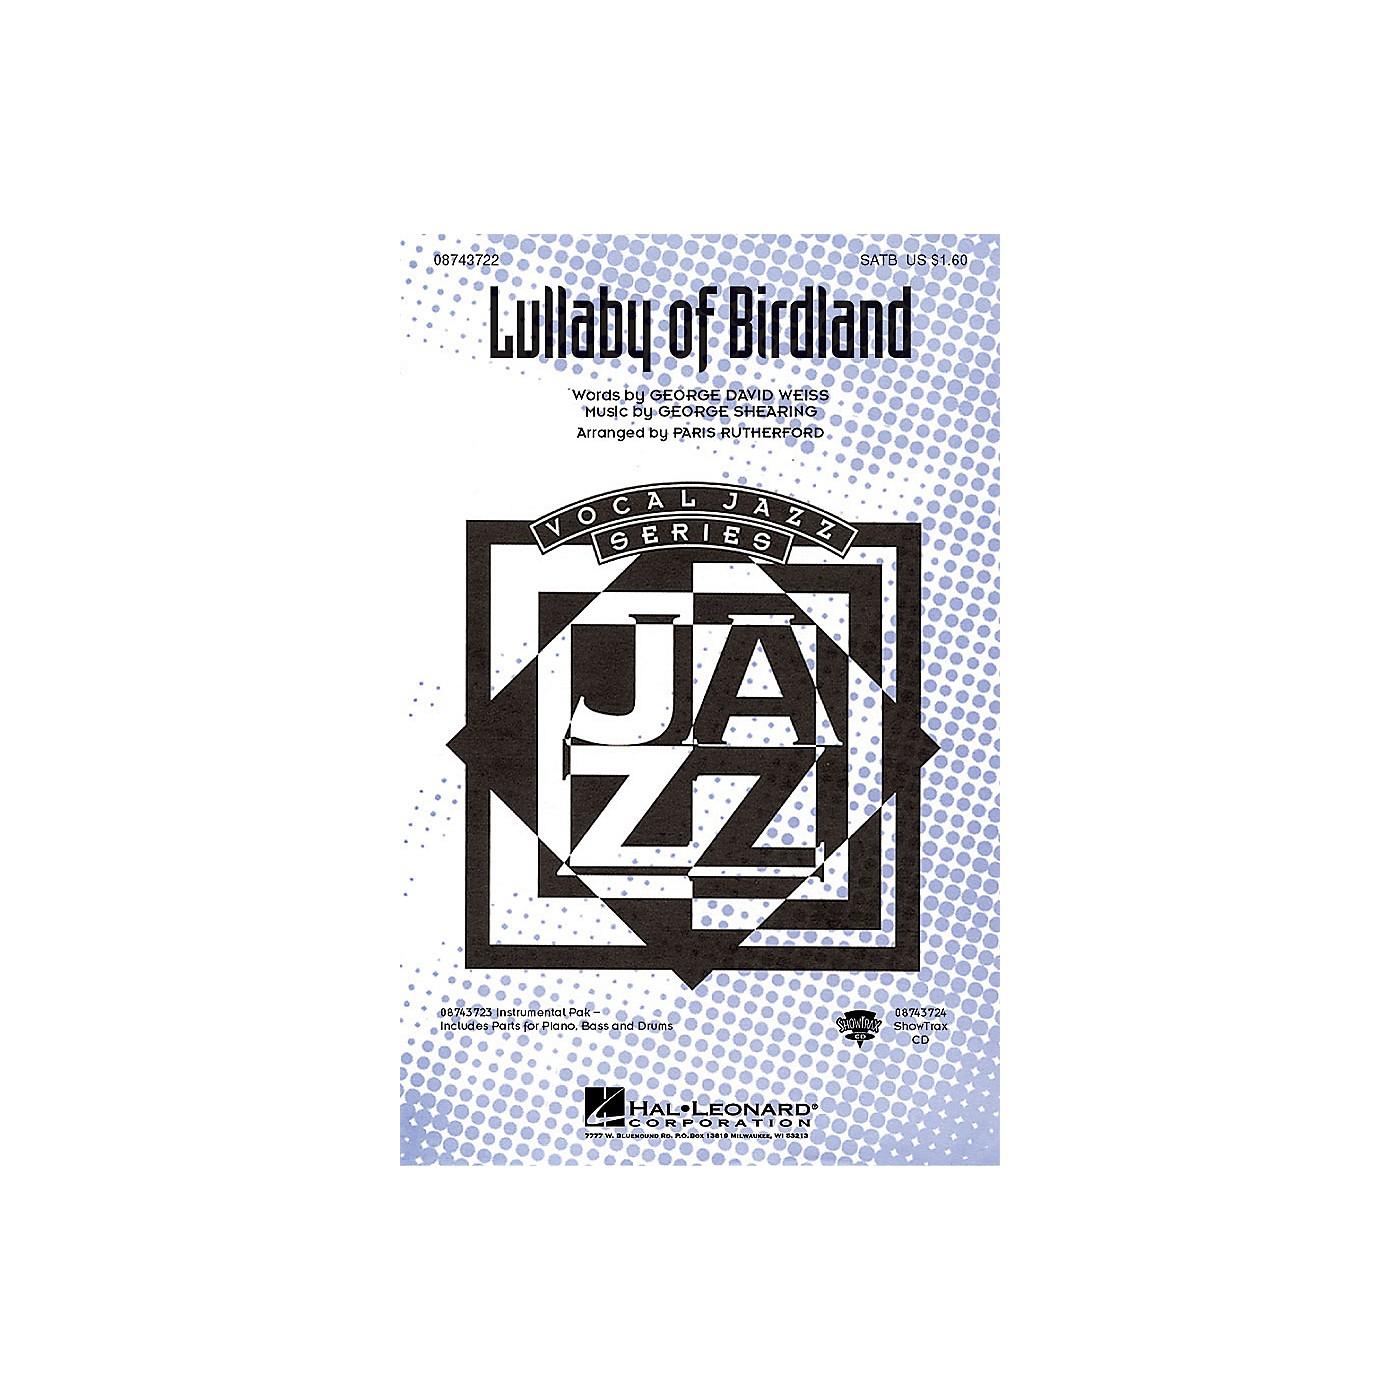 Hal Leonard Lullaby Of Birdland ShowTrax CD Arranged by Paris Rutherford thumbnail